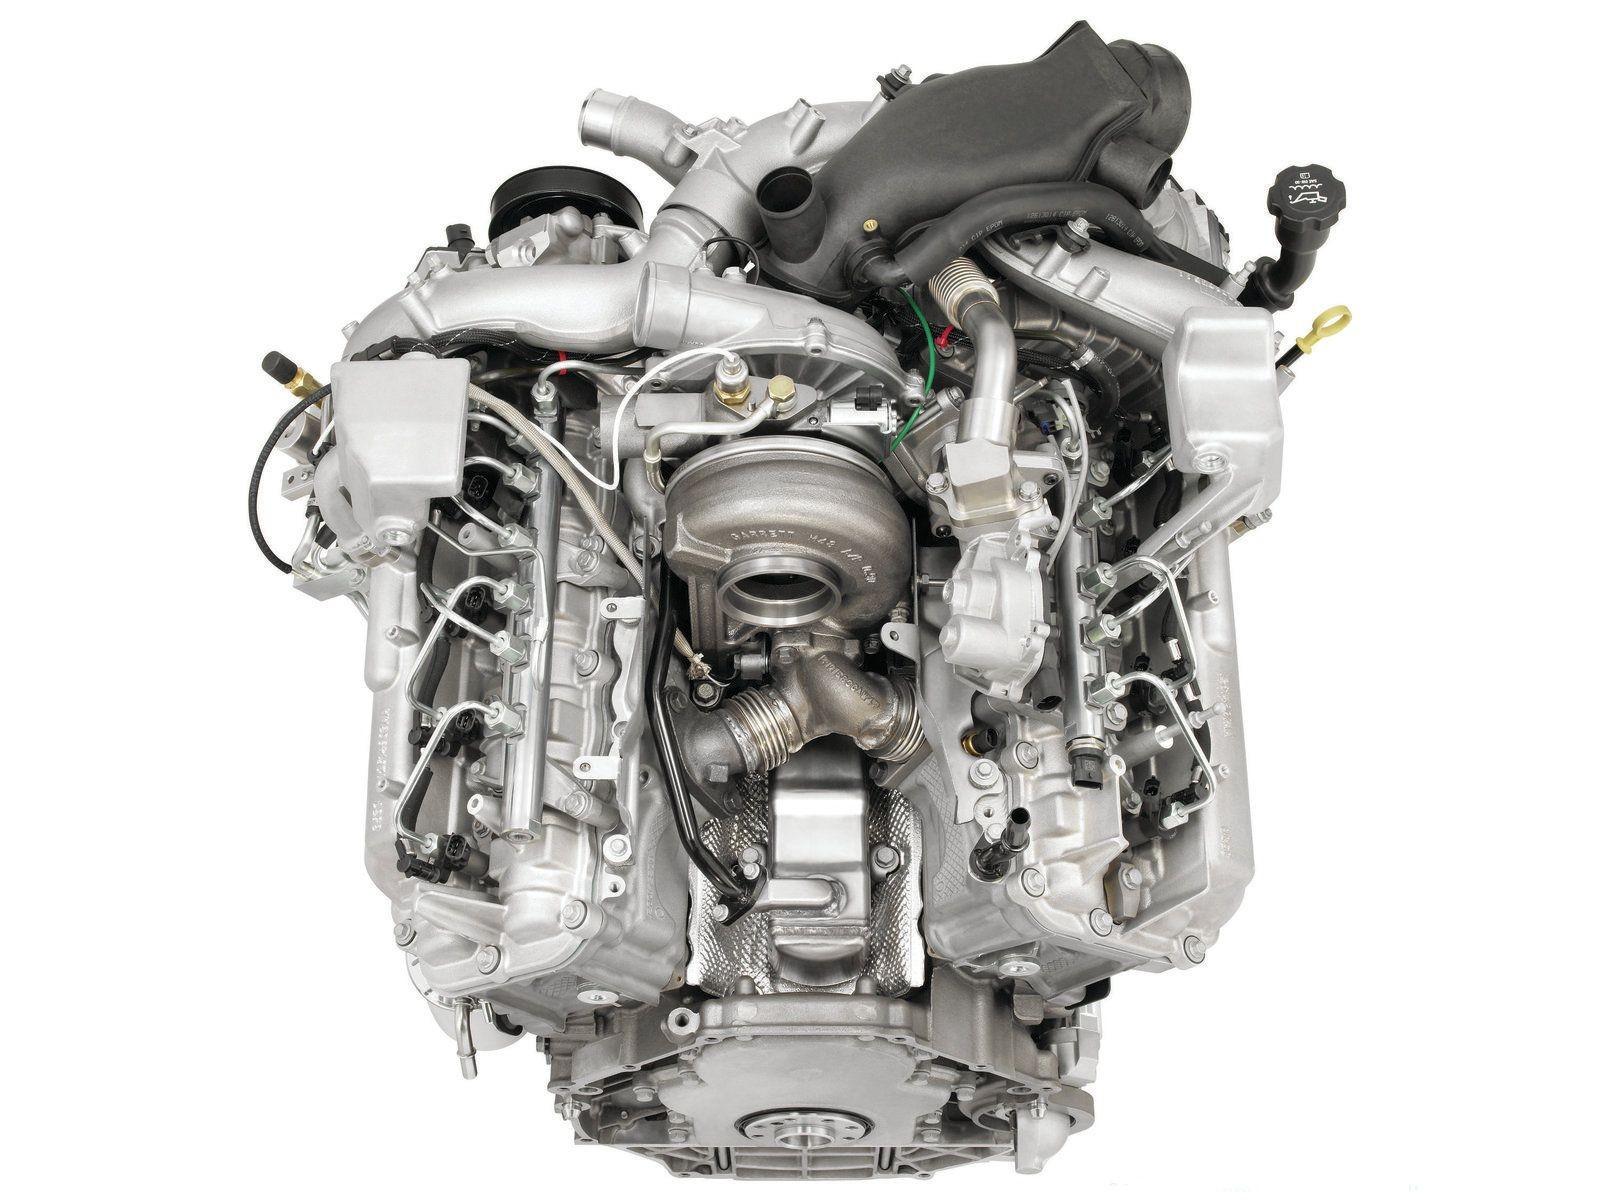 Duramax Diesel Engine Diagram Spy Report Diesel Half ton Trucks Diesel Power Magazine Of Duramax Diesel Engine Diagram